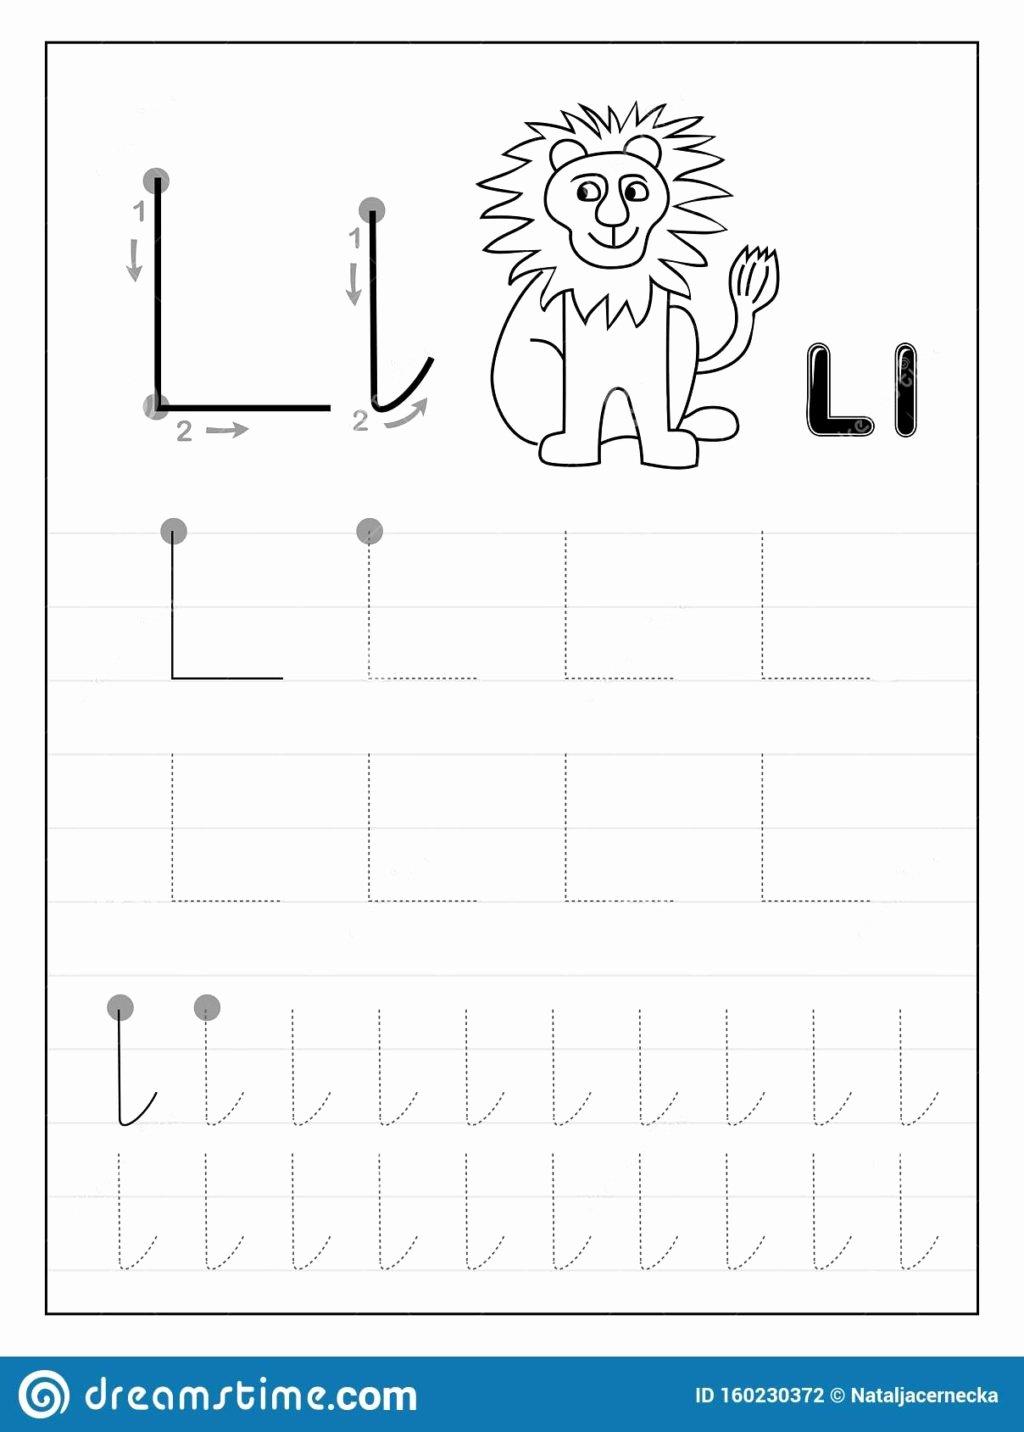 Free Printable Letter L Worksheets for Preschoolers Best Of Worksheet Tracing Alphabet Letter L Black and White